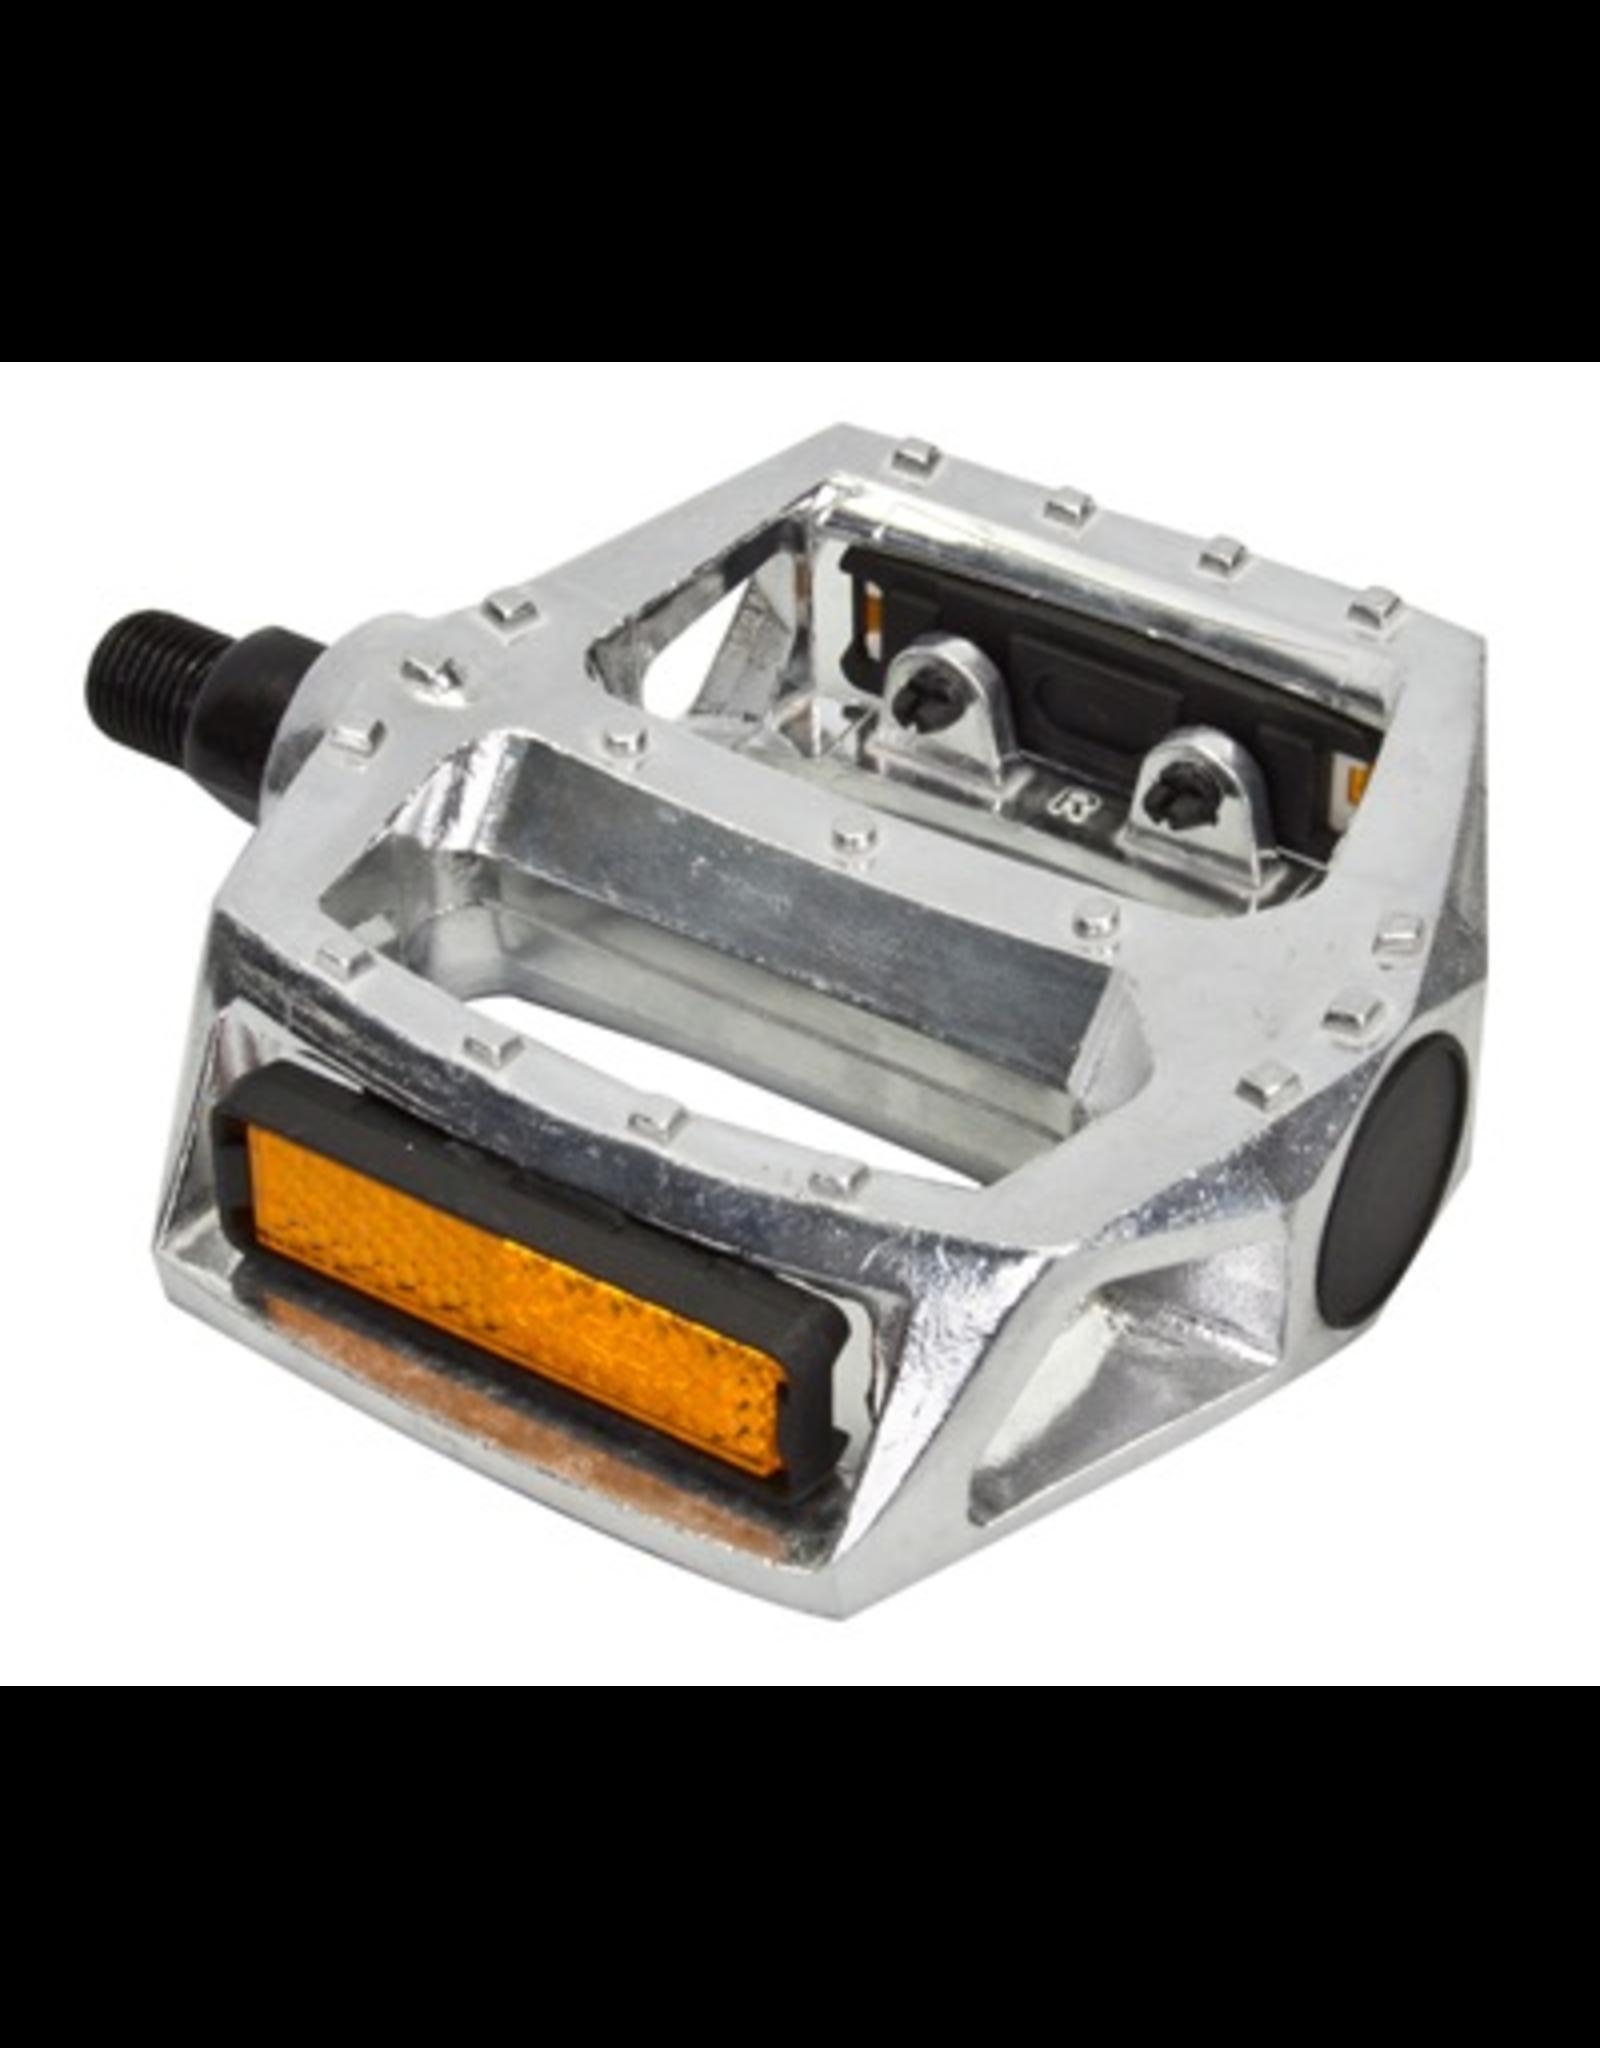 "Sunlite Sunlite MX Alloy Pedals 1/2"", Silver"